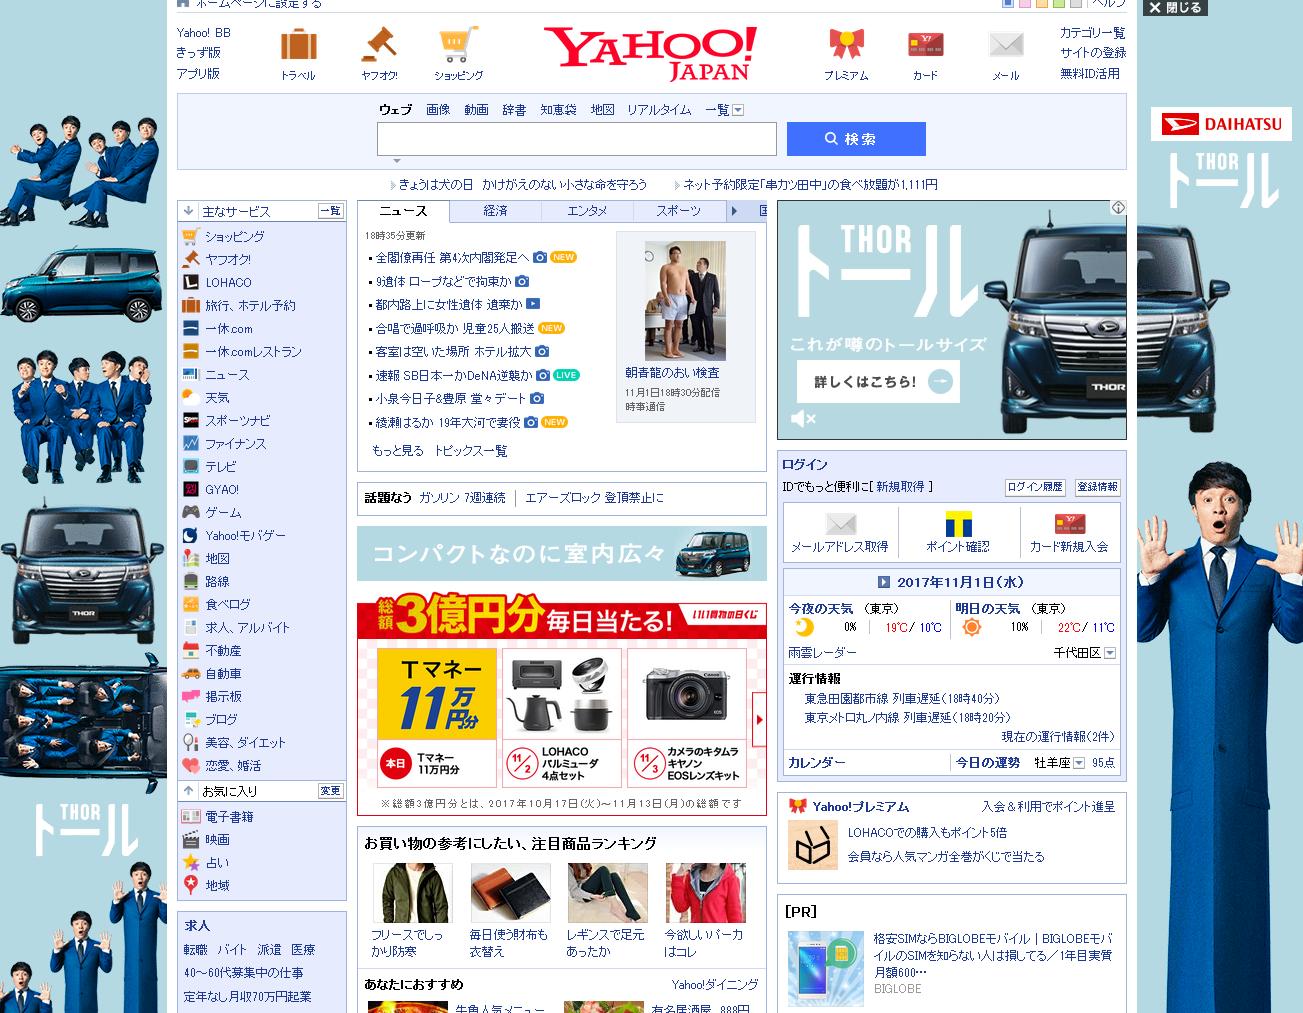 Yahoo!JAPANトップインパクト